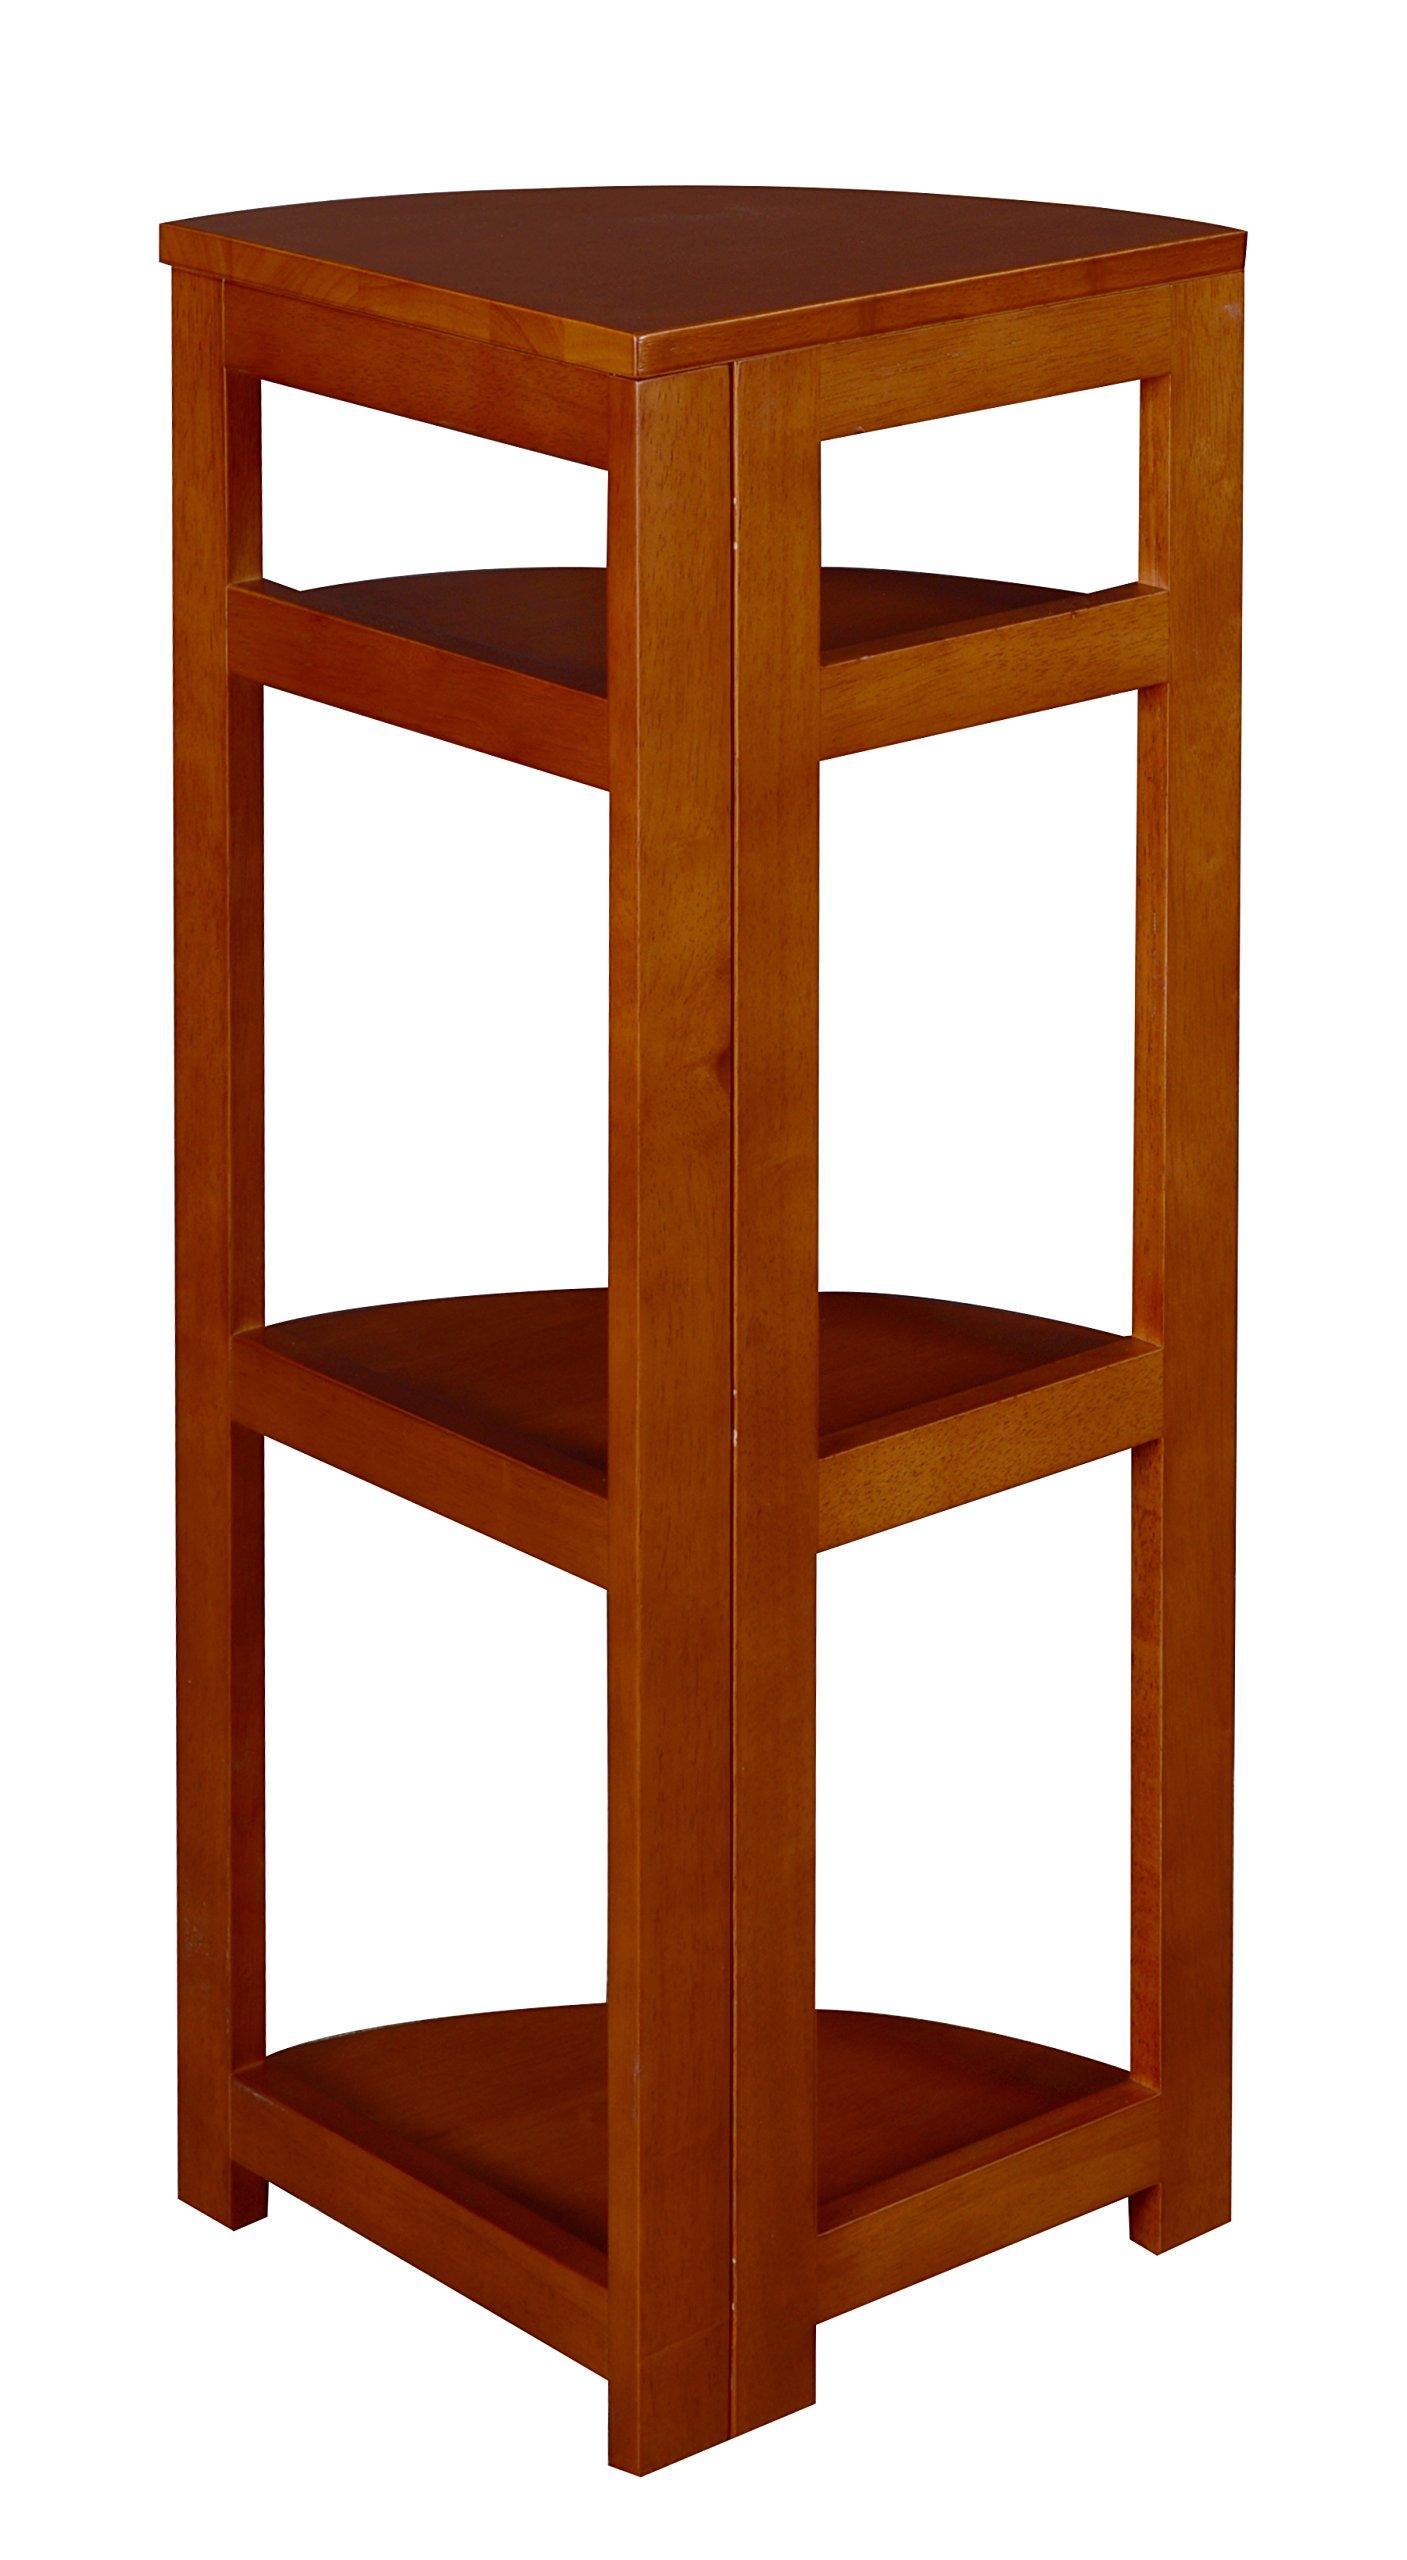 Regency Flip Flop 34-inch High Corner Folding Bookcase- Cherry by Regency (Image #3)